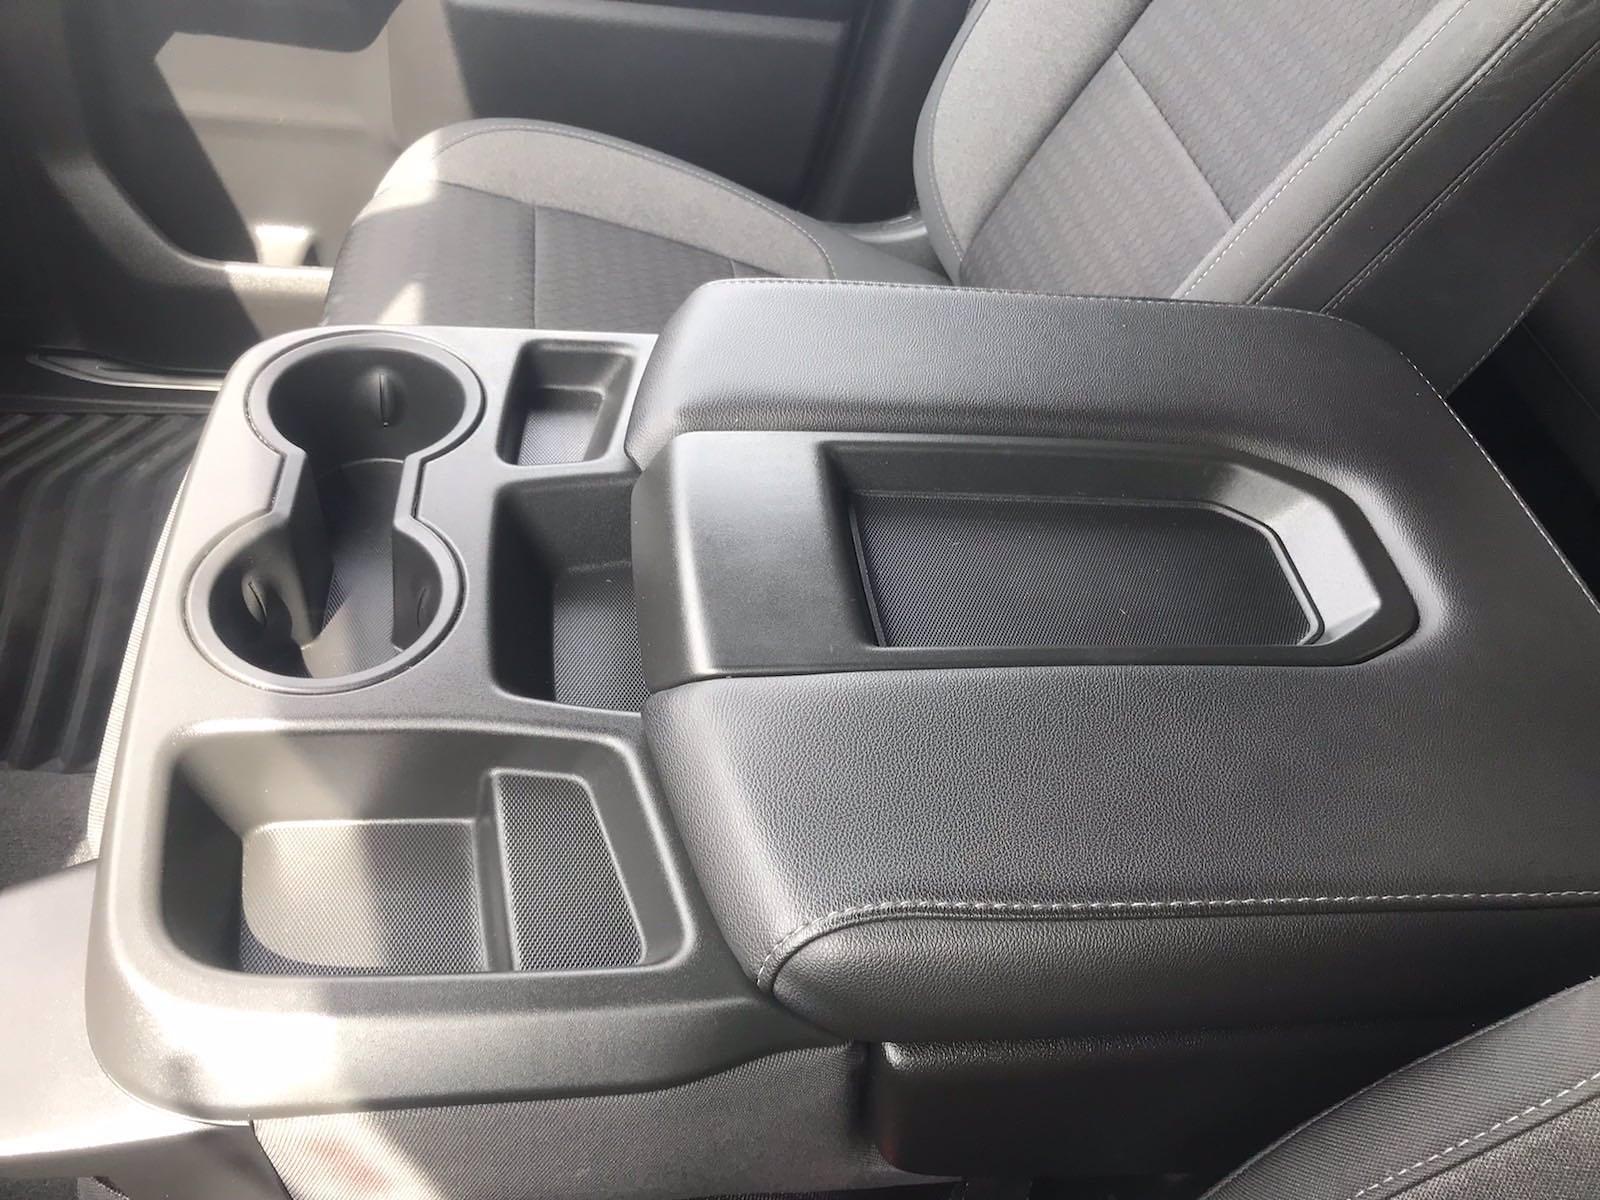 2020 Chevrolet Silverado 1500 Crew Cab 4x4, Pickup #16466PN - photo 38